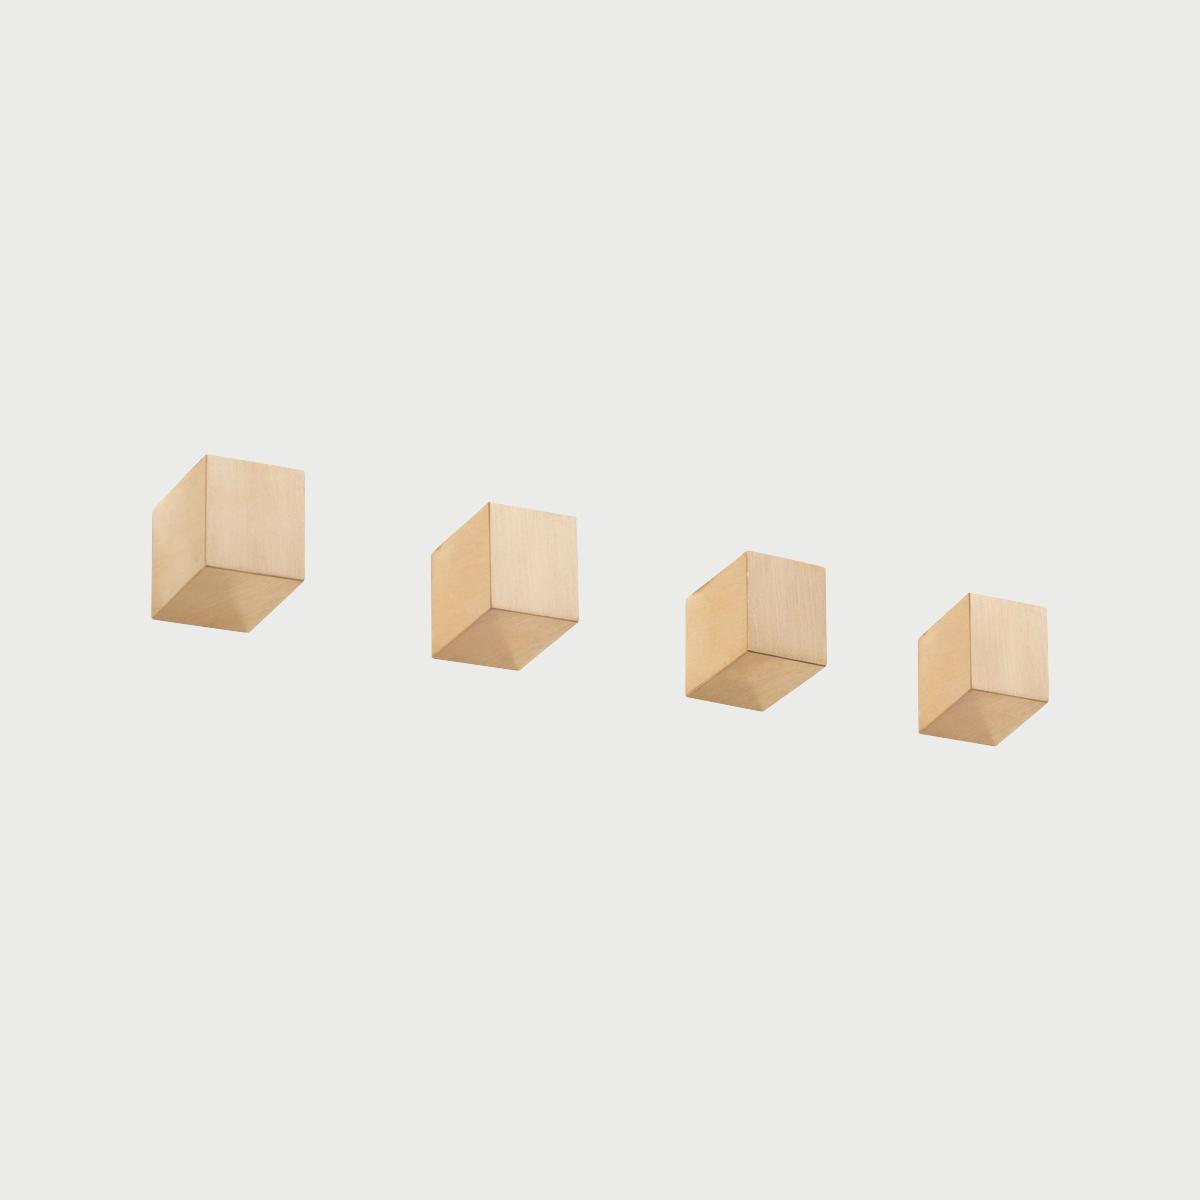 Brass 4 row square knobs